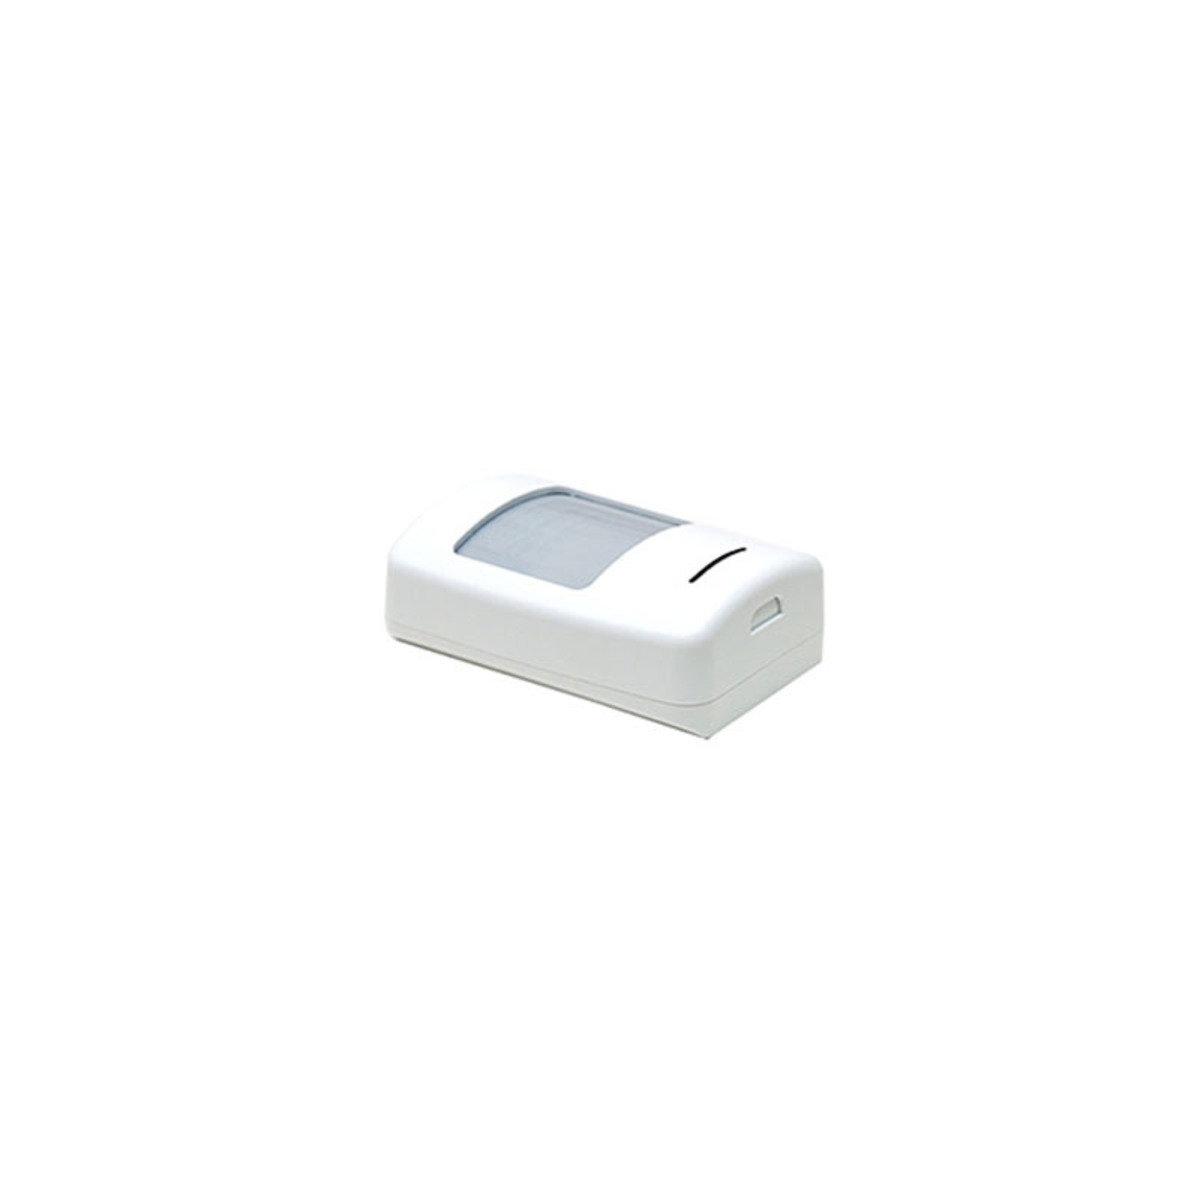 ZigBee 被動式紅外線感應器 PIR motion detector